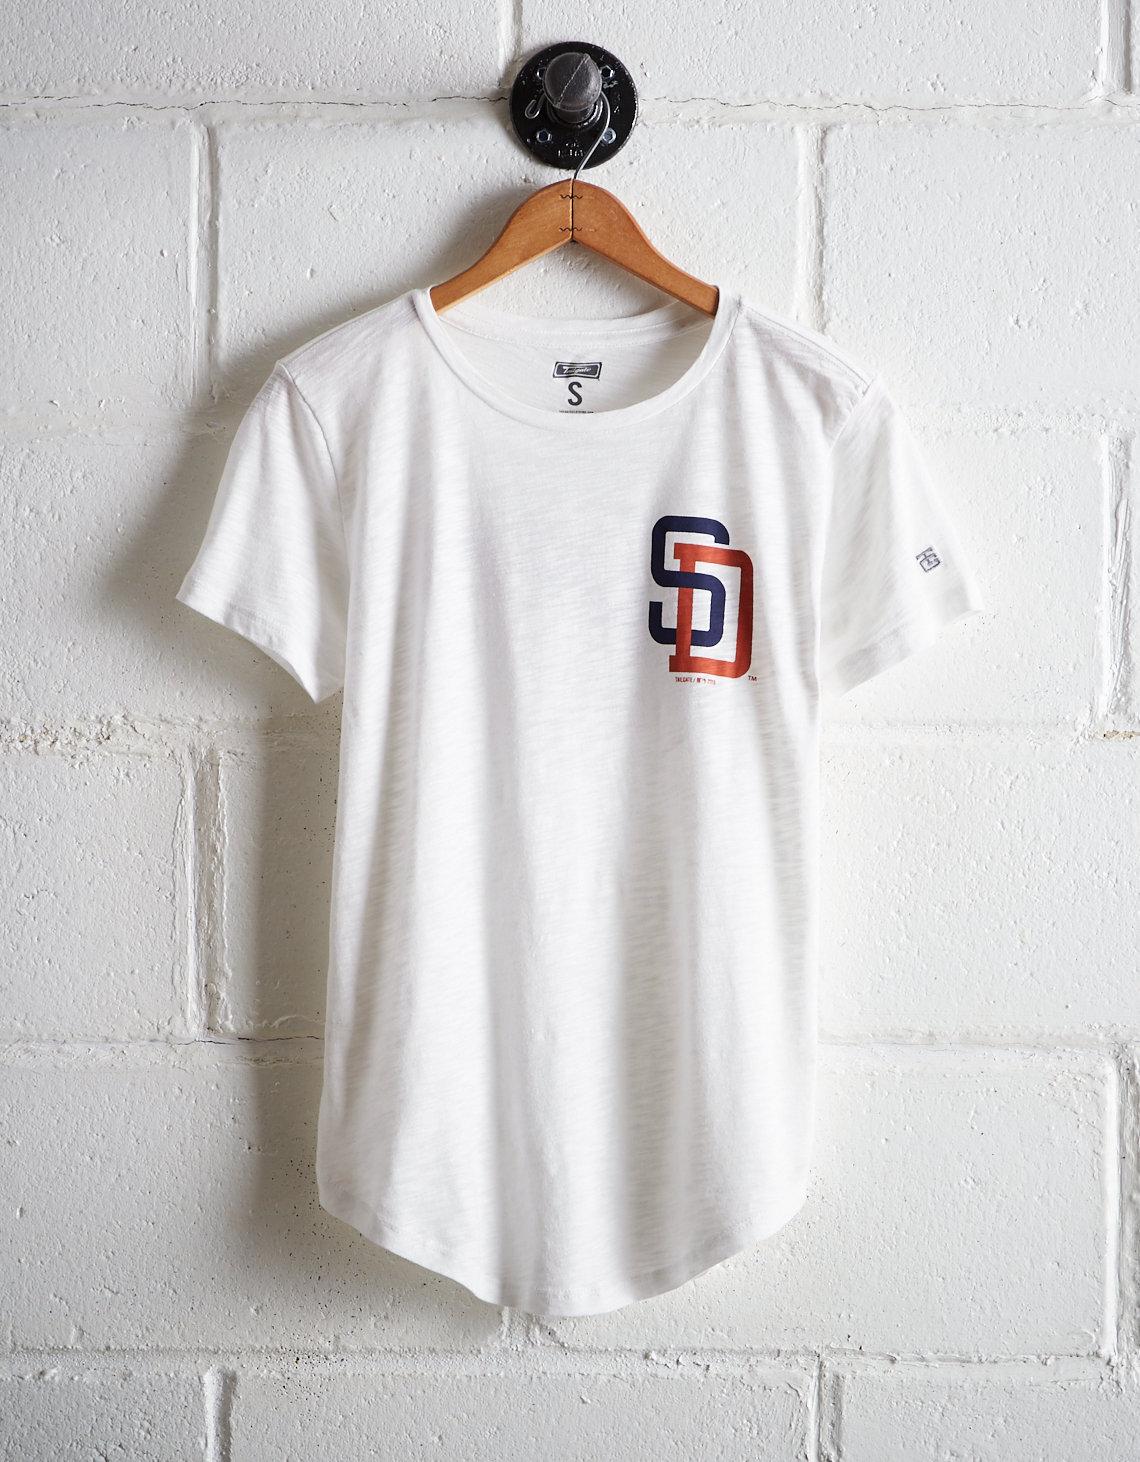 timeless design d98fd 01c11 Tailgate Women's San Diego Padres T-Shirt